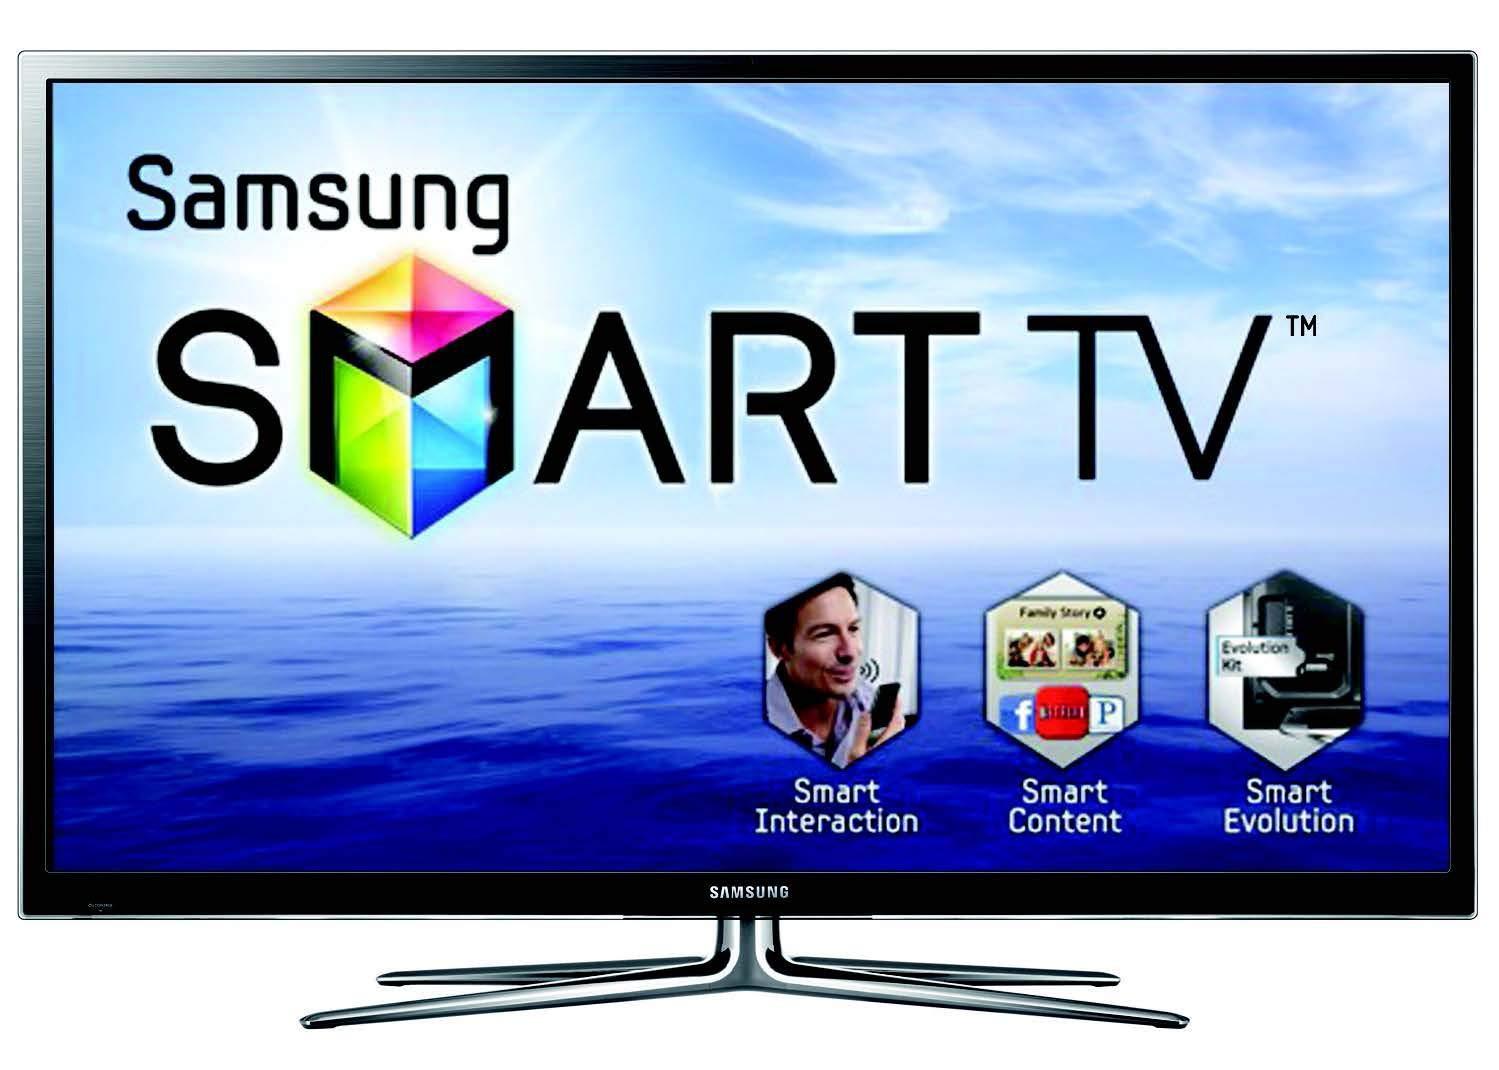 An image of Samsung PN64E8000 64-Inch 3D HD Plasma Smart TV